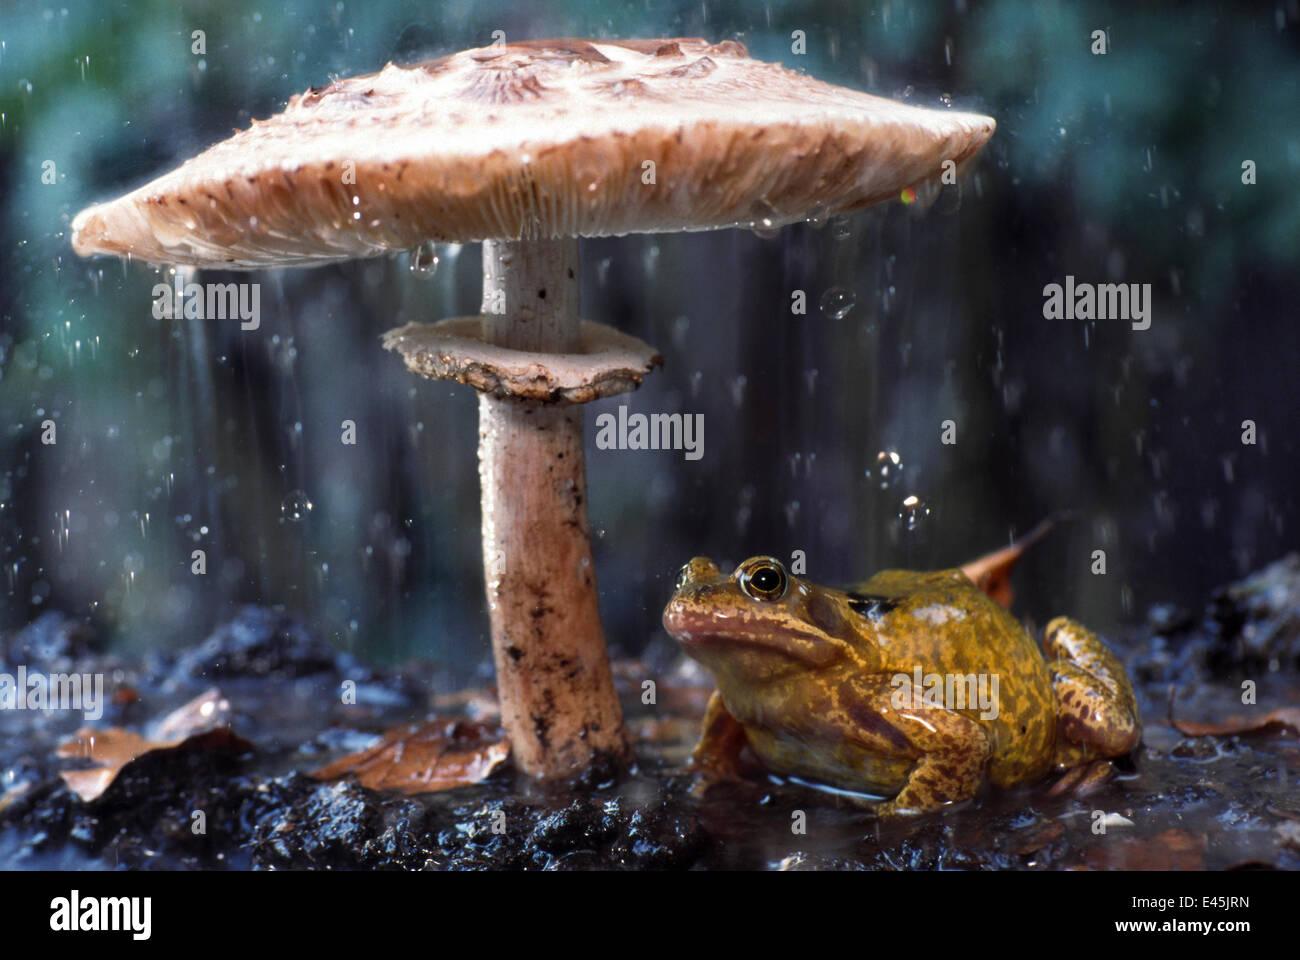 Common frog (Rana temporaria) sheltering from rain under toadstool (Macrolepiota procera) the Netherlands - Stock Image